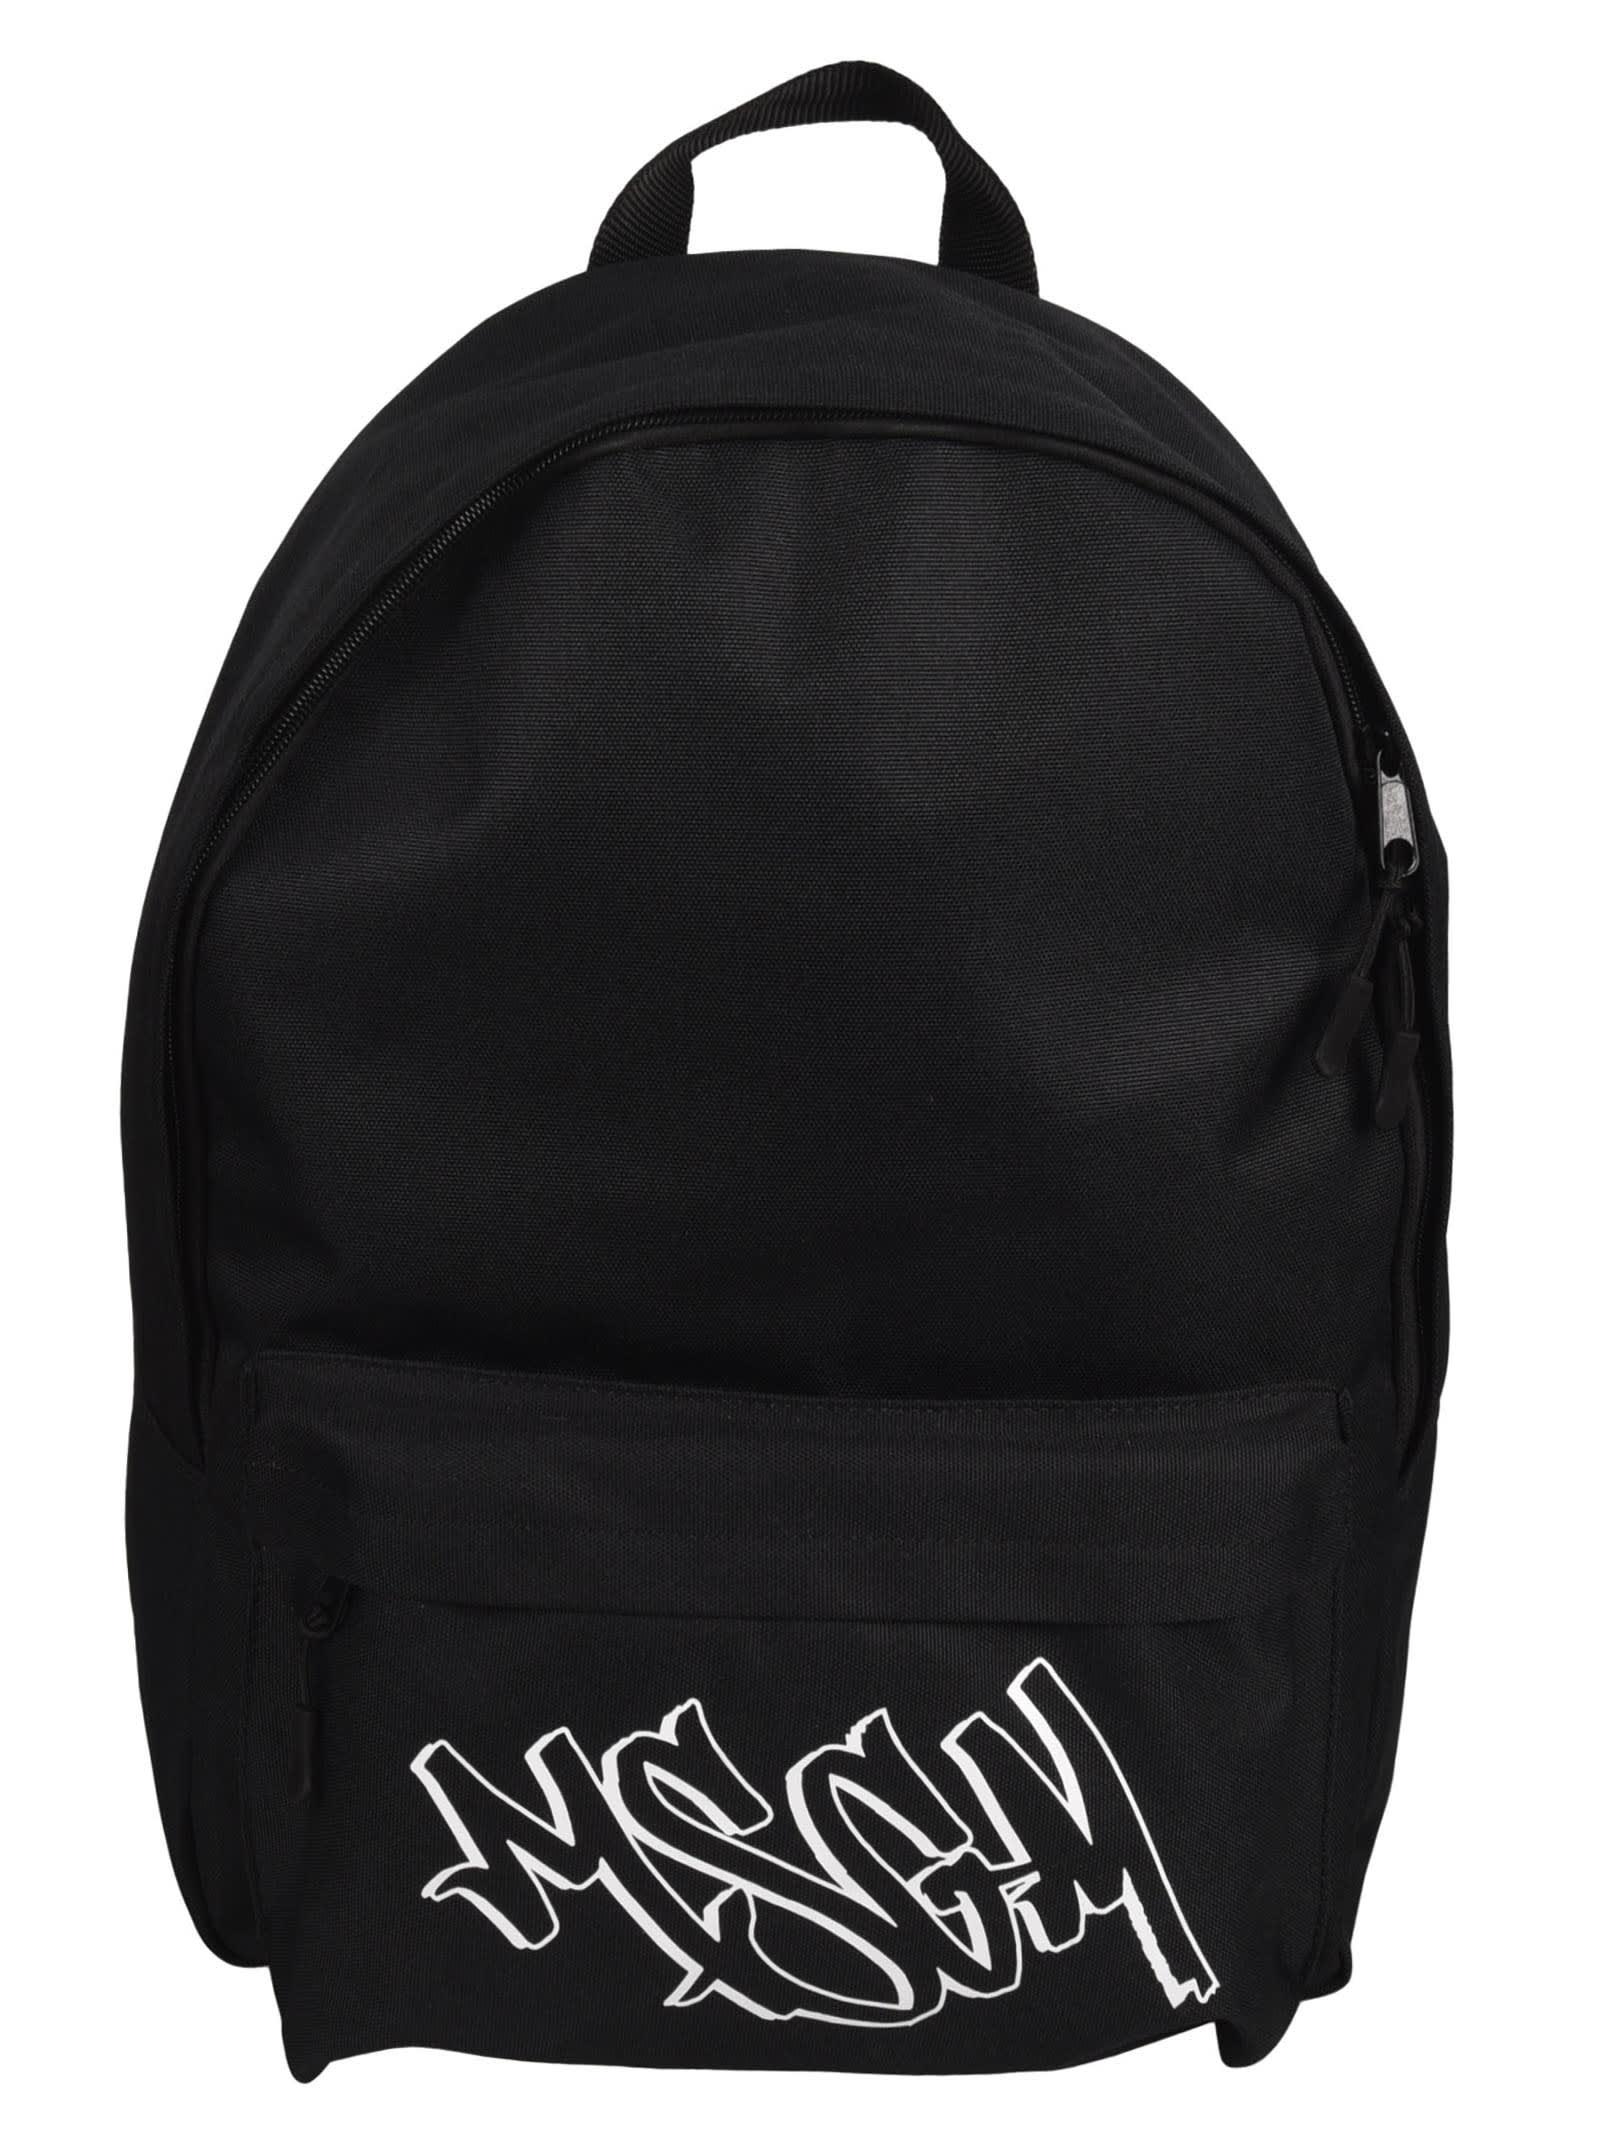 Msgm Backpacks GRAFFITI LOGO BACKPACK